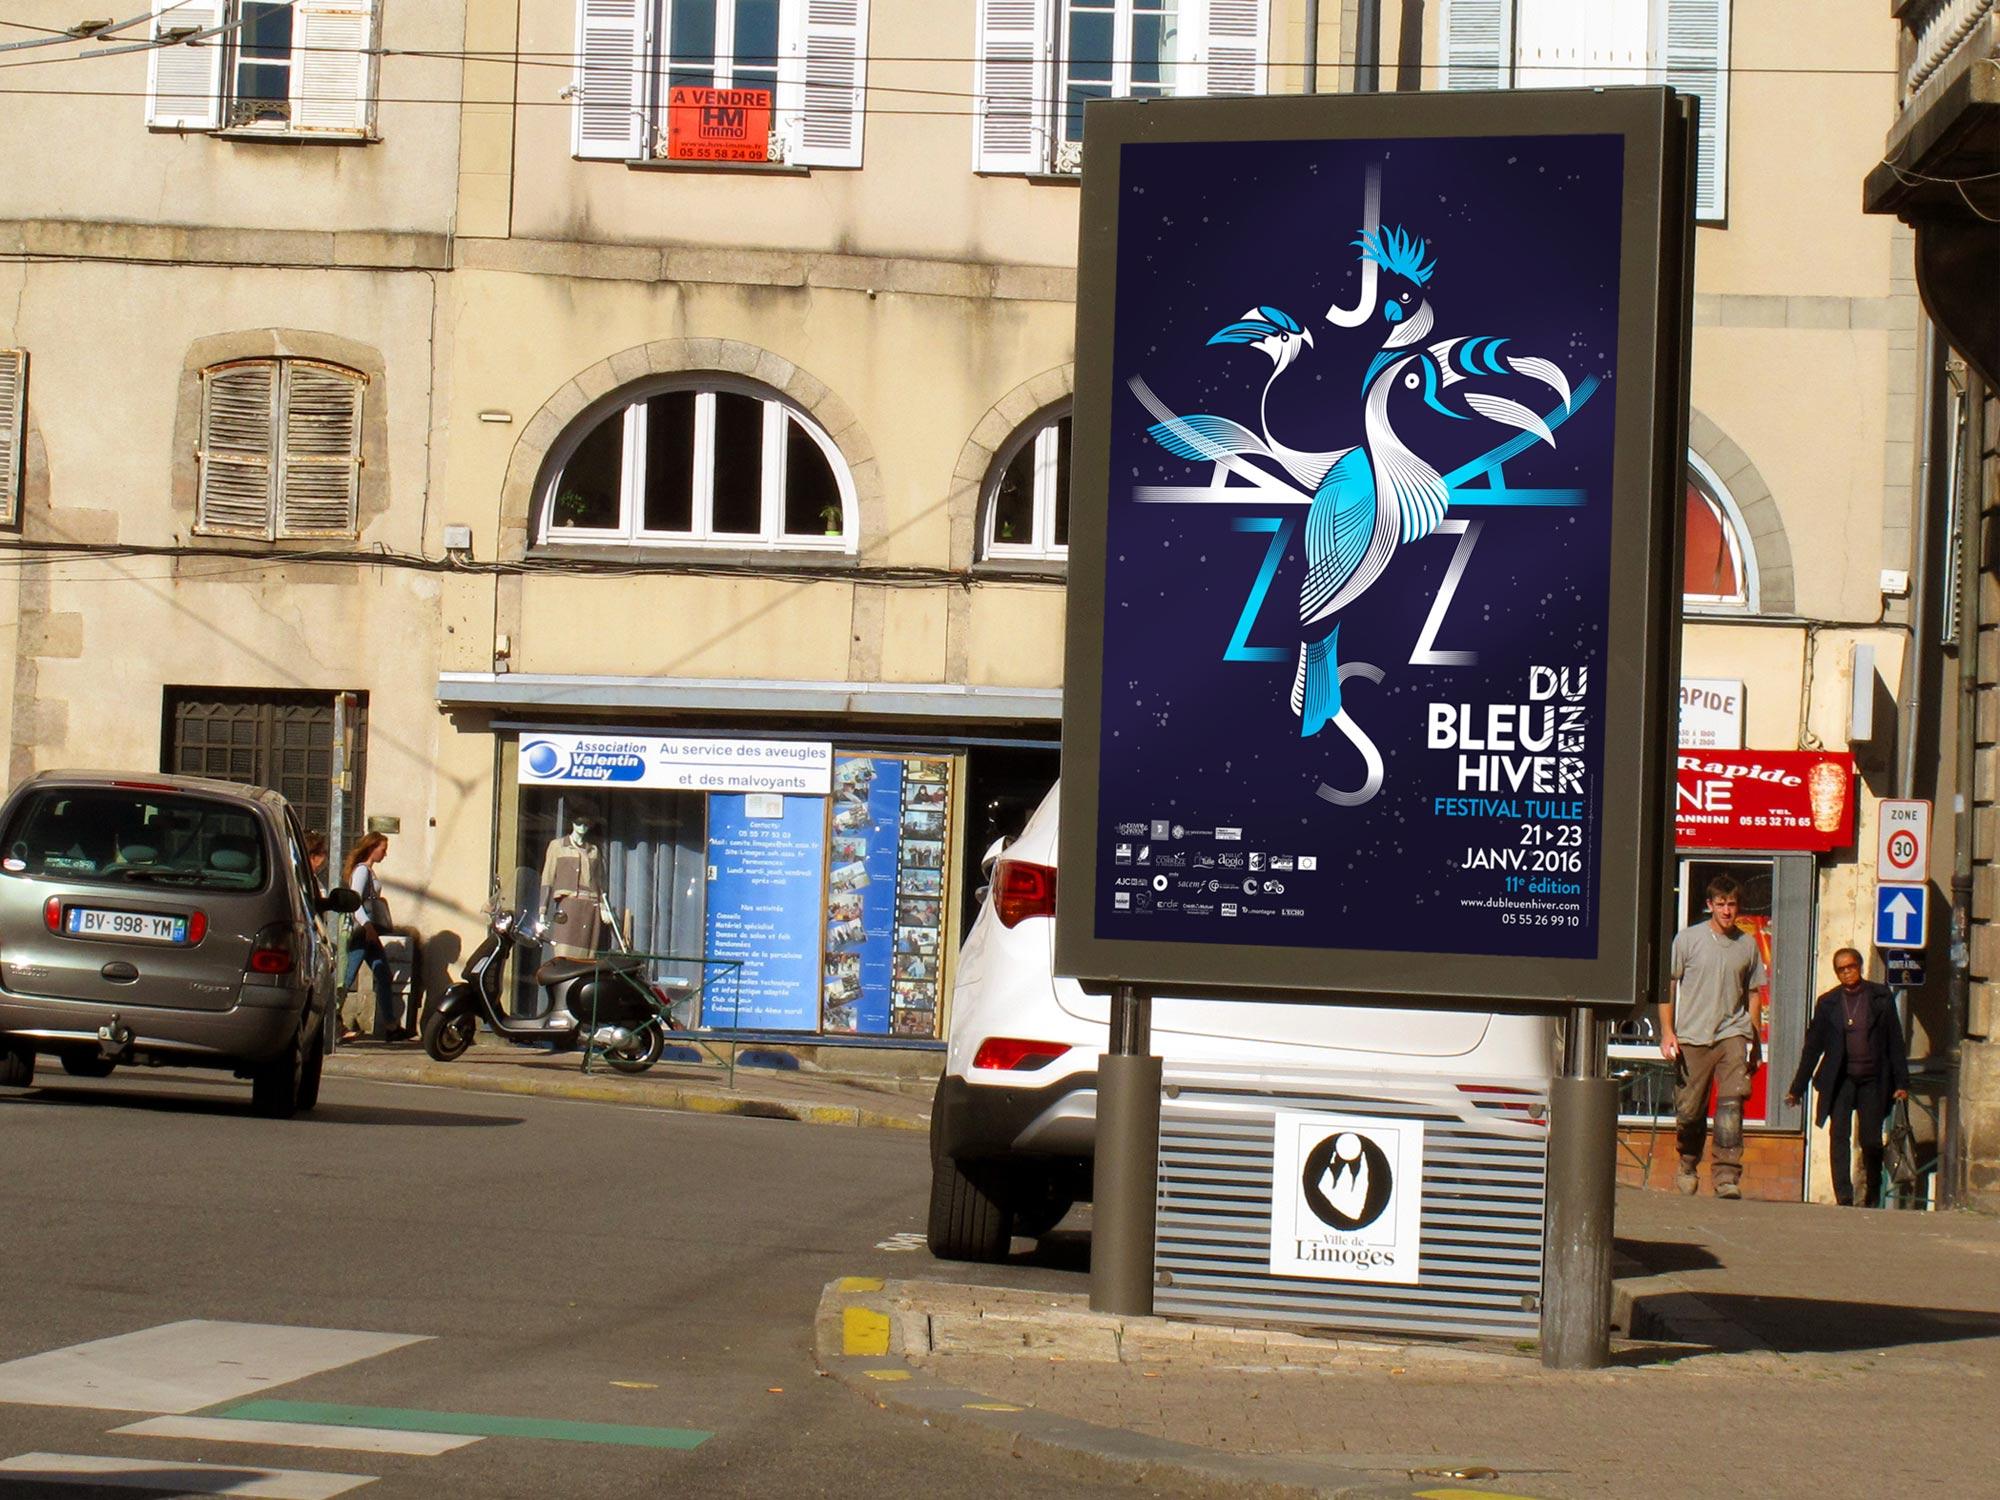 http://a-aa.fr/projet/du-bleu-en-hiver-2016/